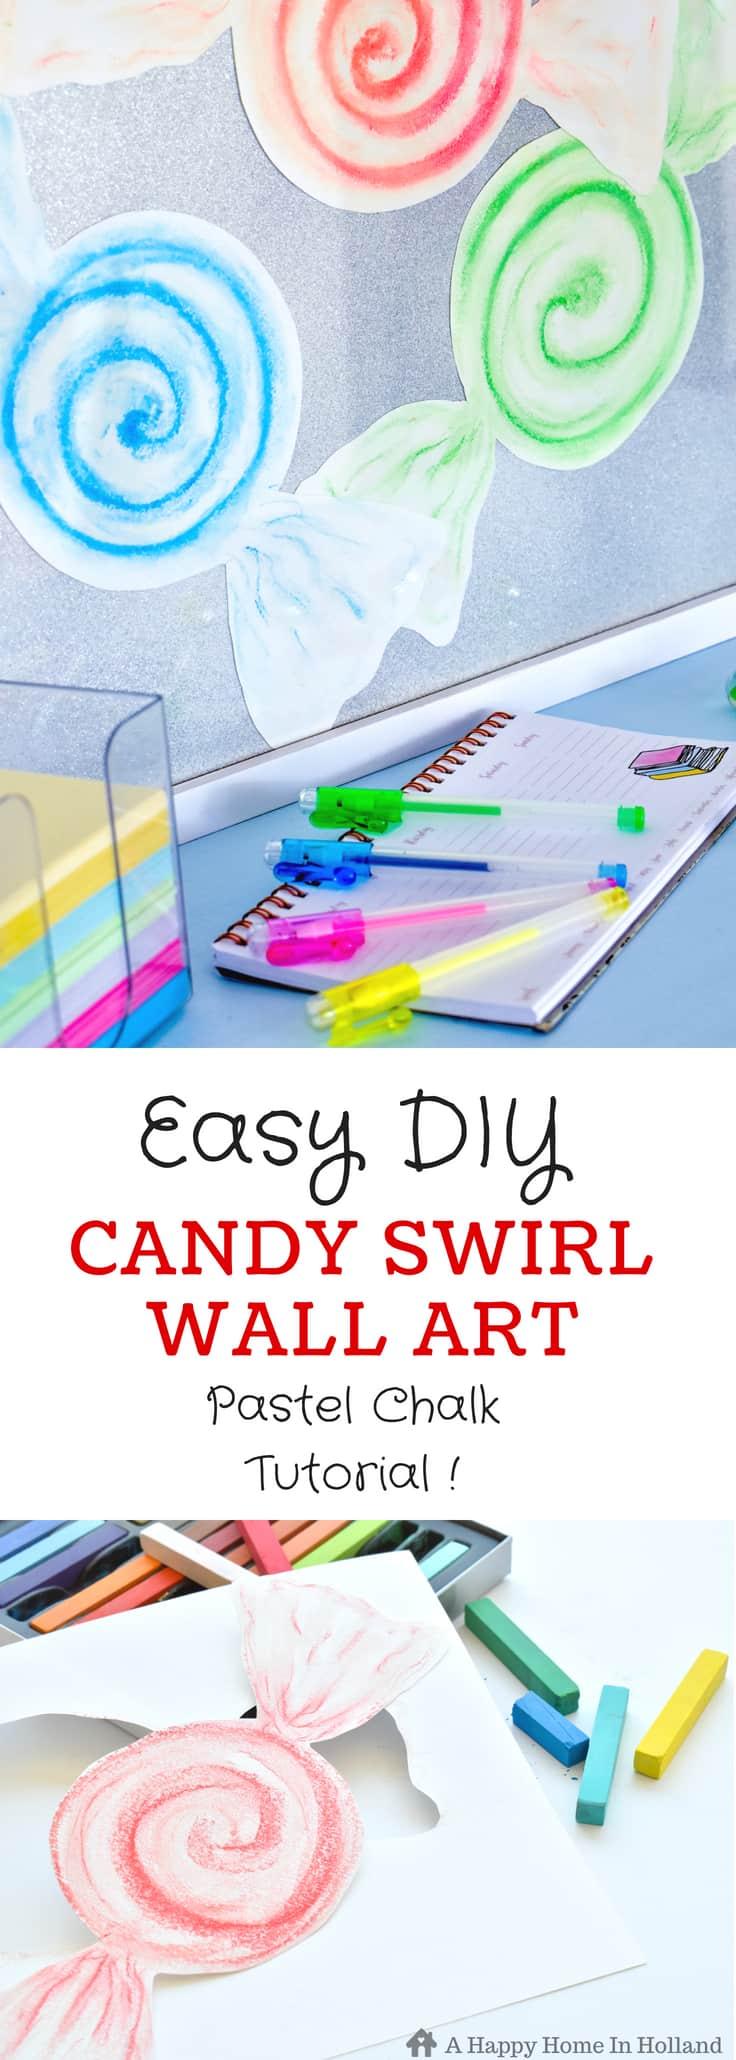 How to create fun Candy Swirl wall art using pastel chalks. #diywallart #girlsroom #diywalldecor #candydecor